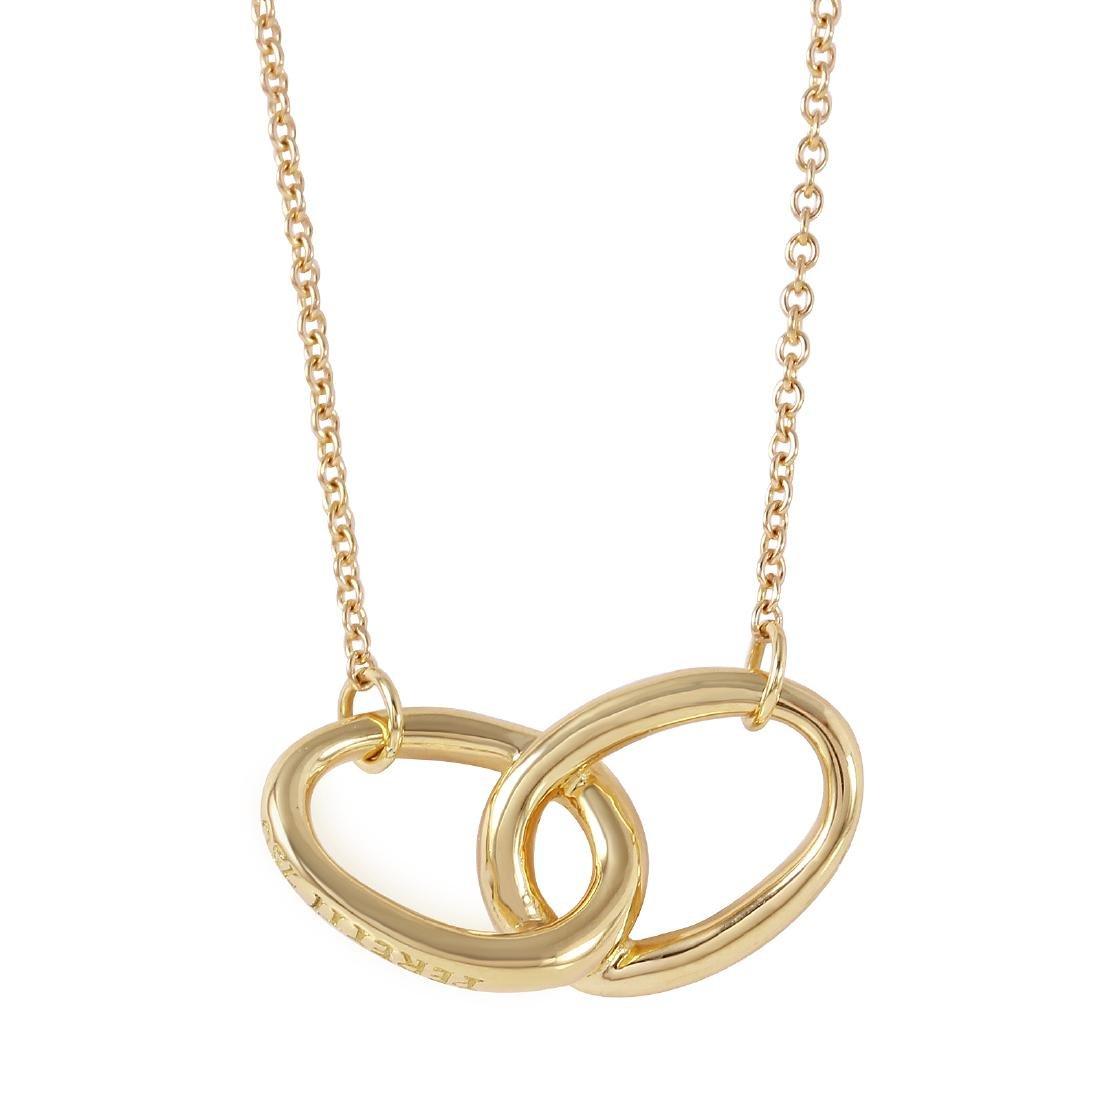 ELSA PERETTI TIFFANY & CO. 18KT Gold Necklace